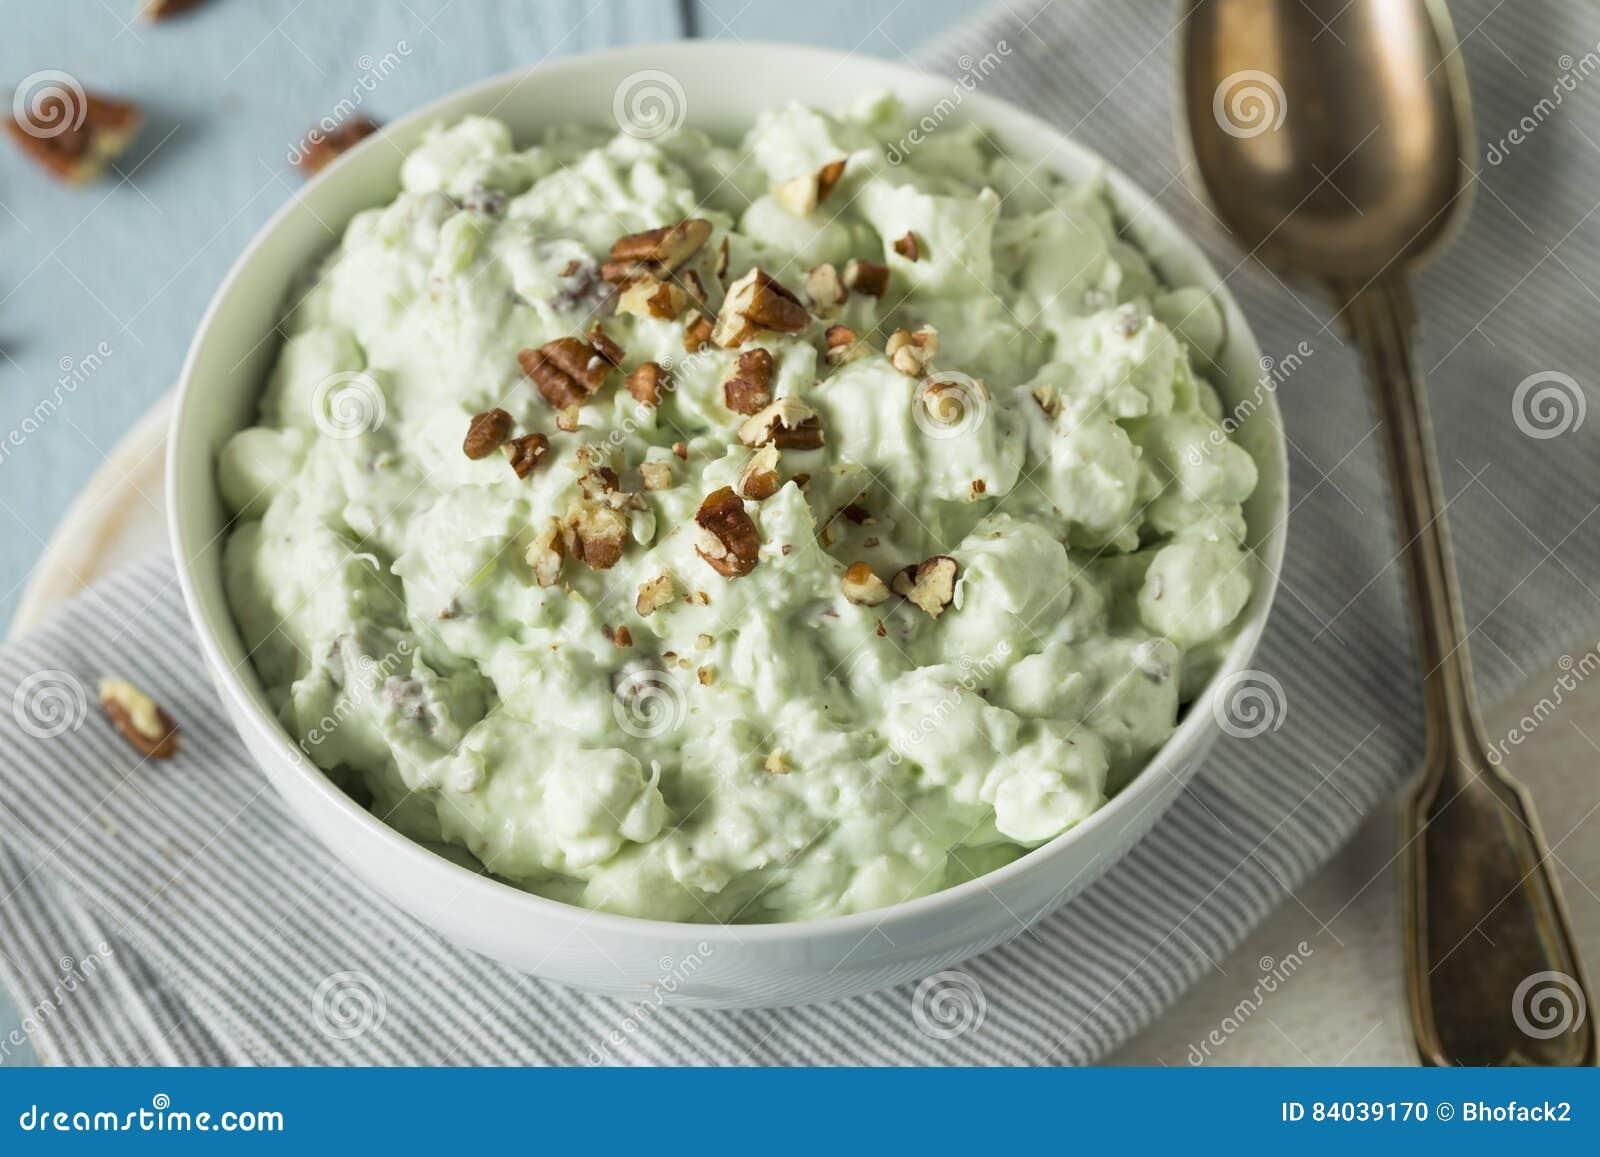 Dessert vert fait maison de duvet de pistache